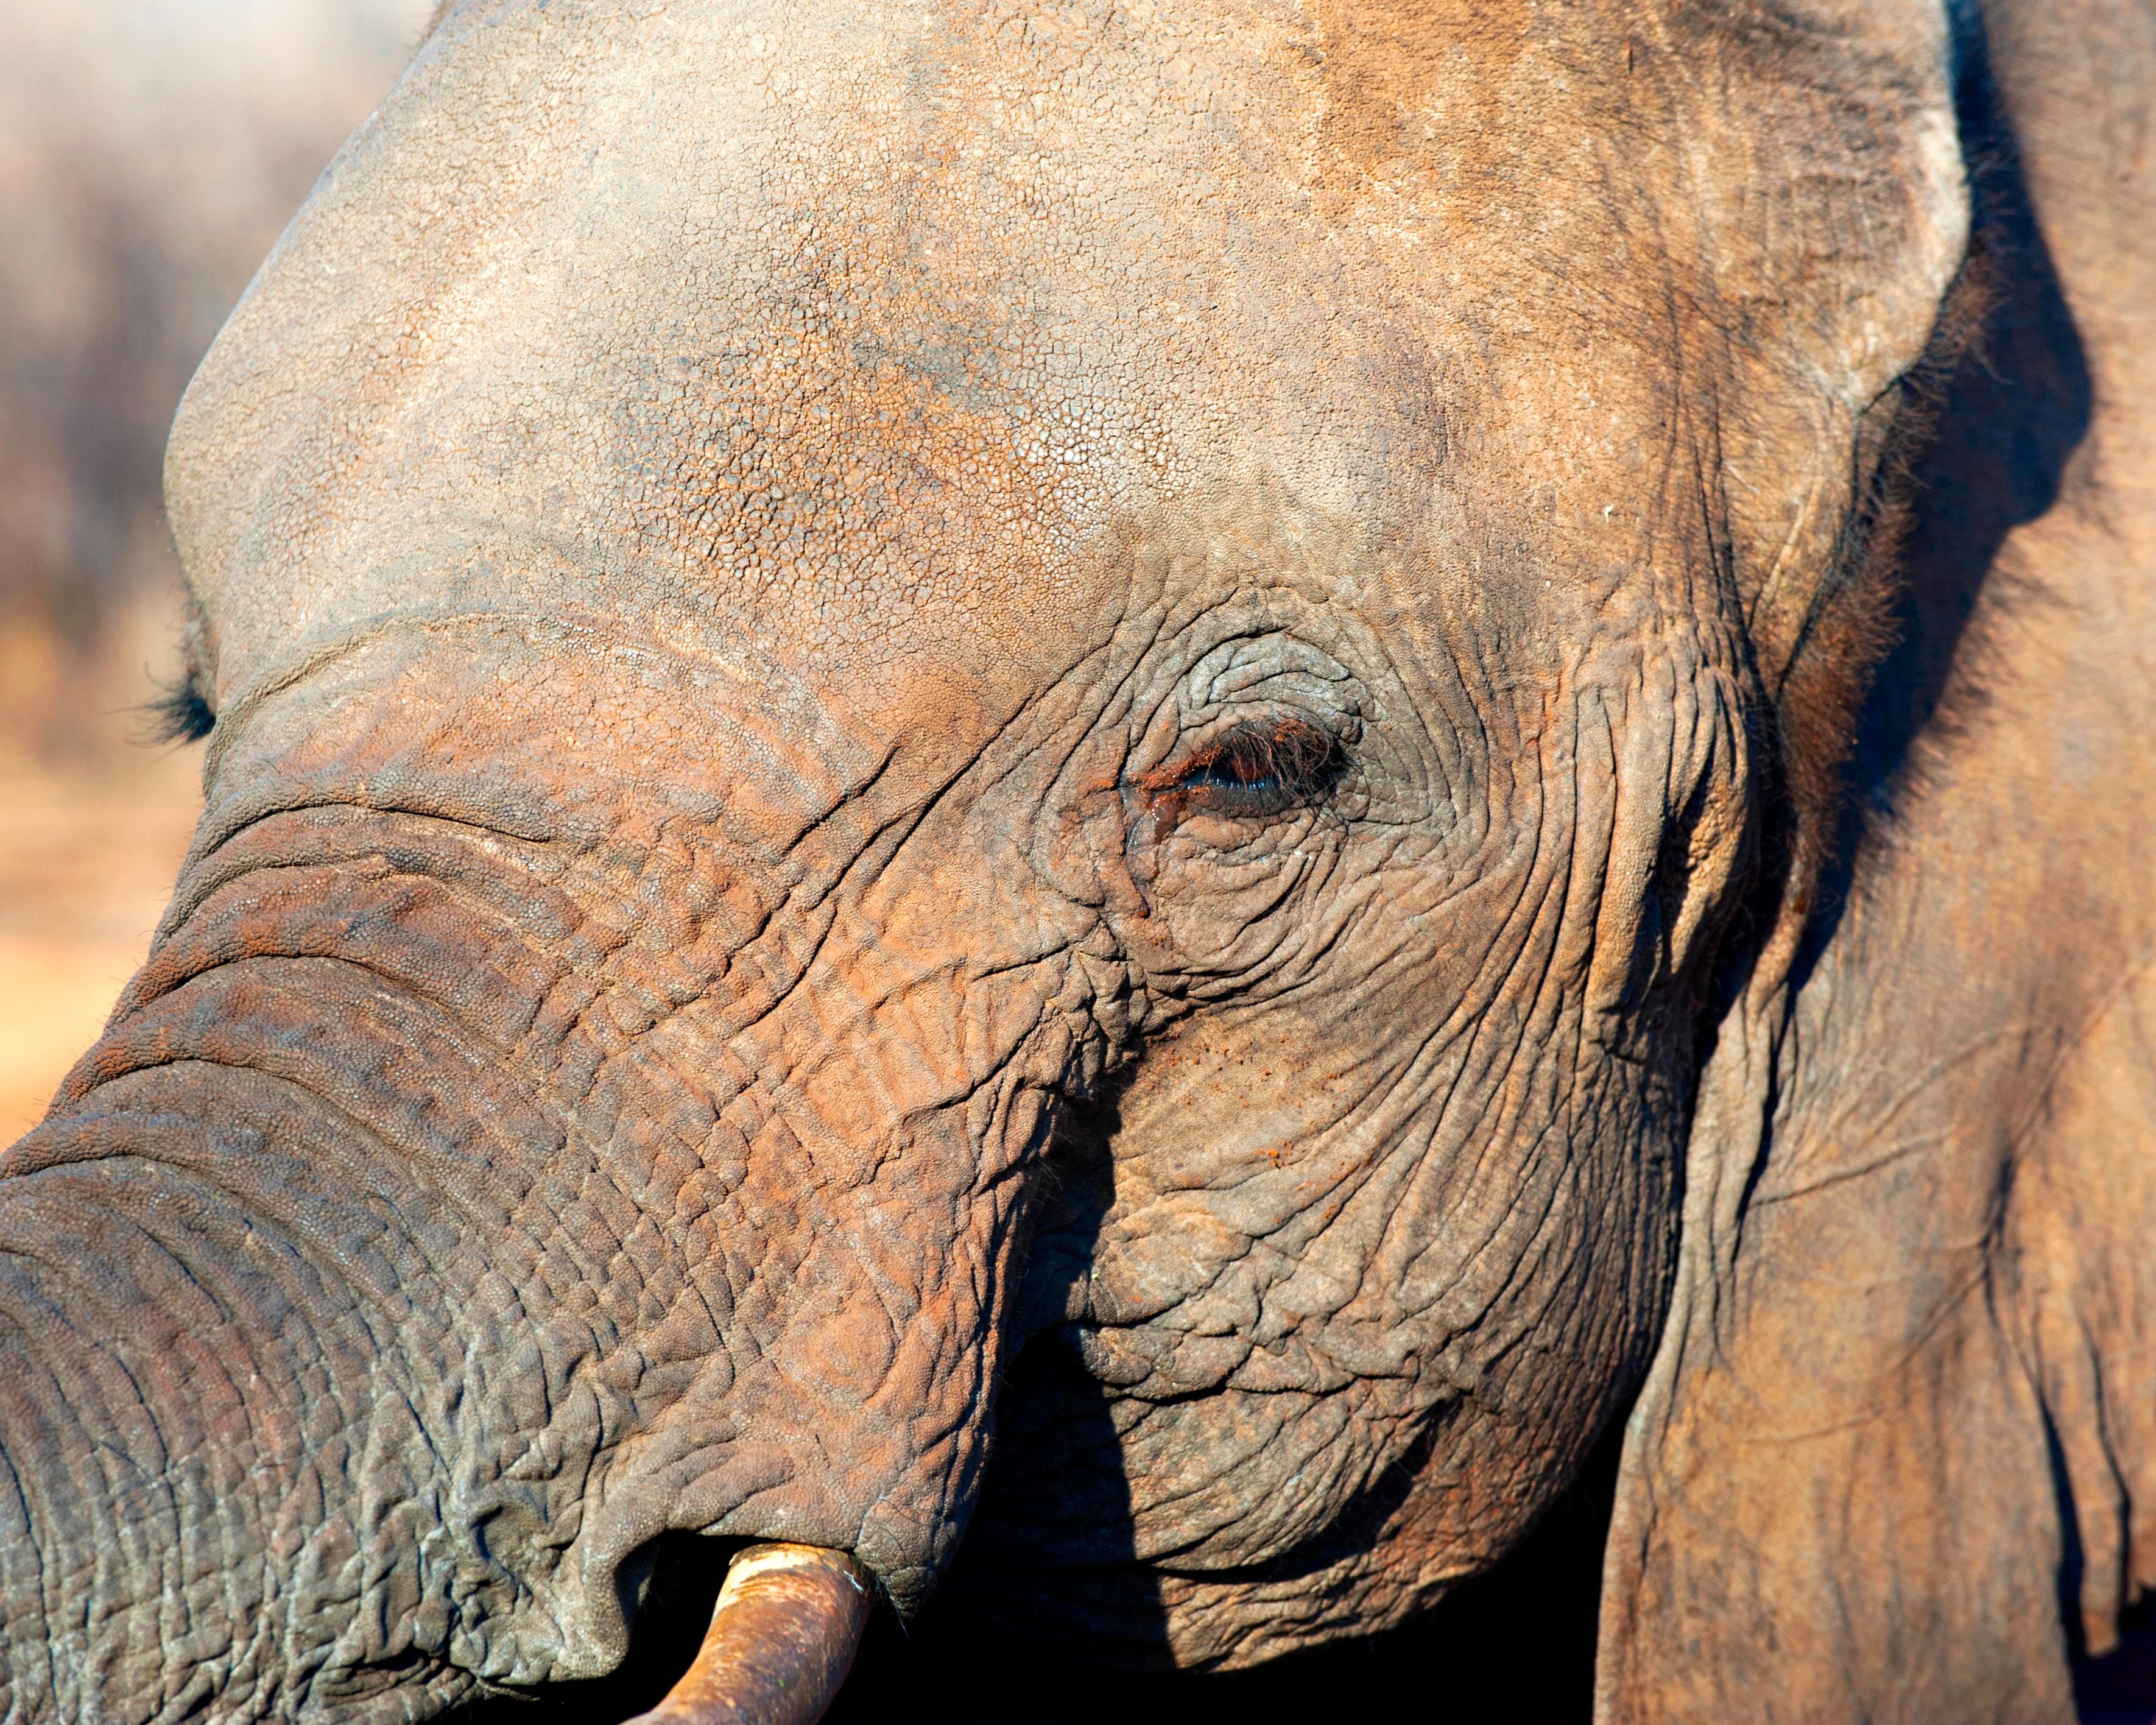 Elephant, Animal, Big, Fat, Giant, HQ Photo